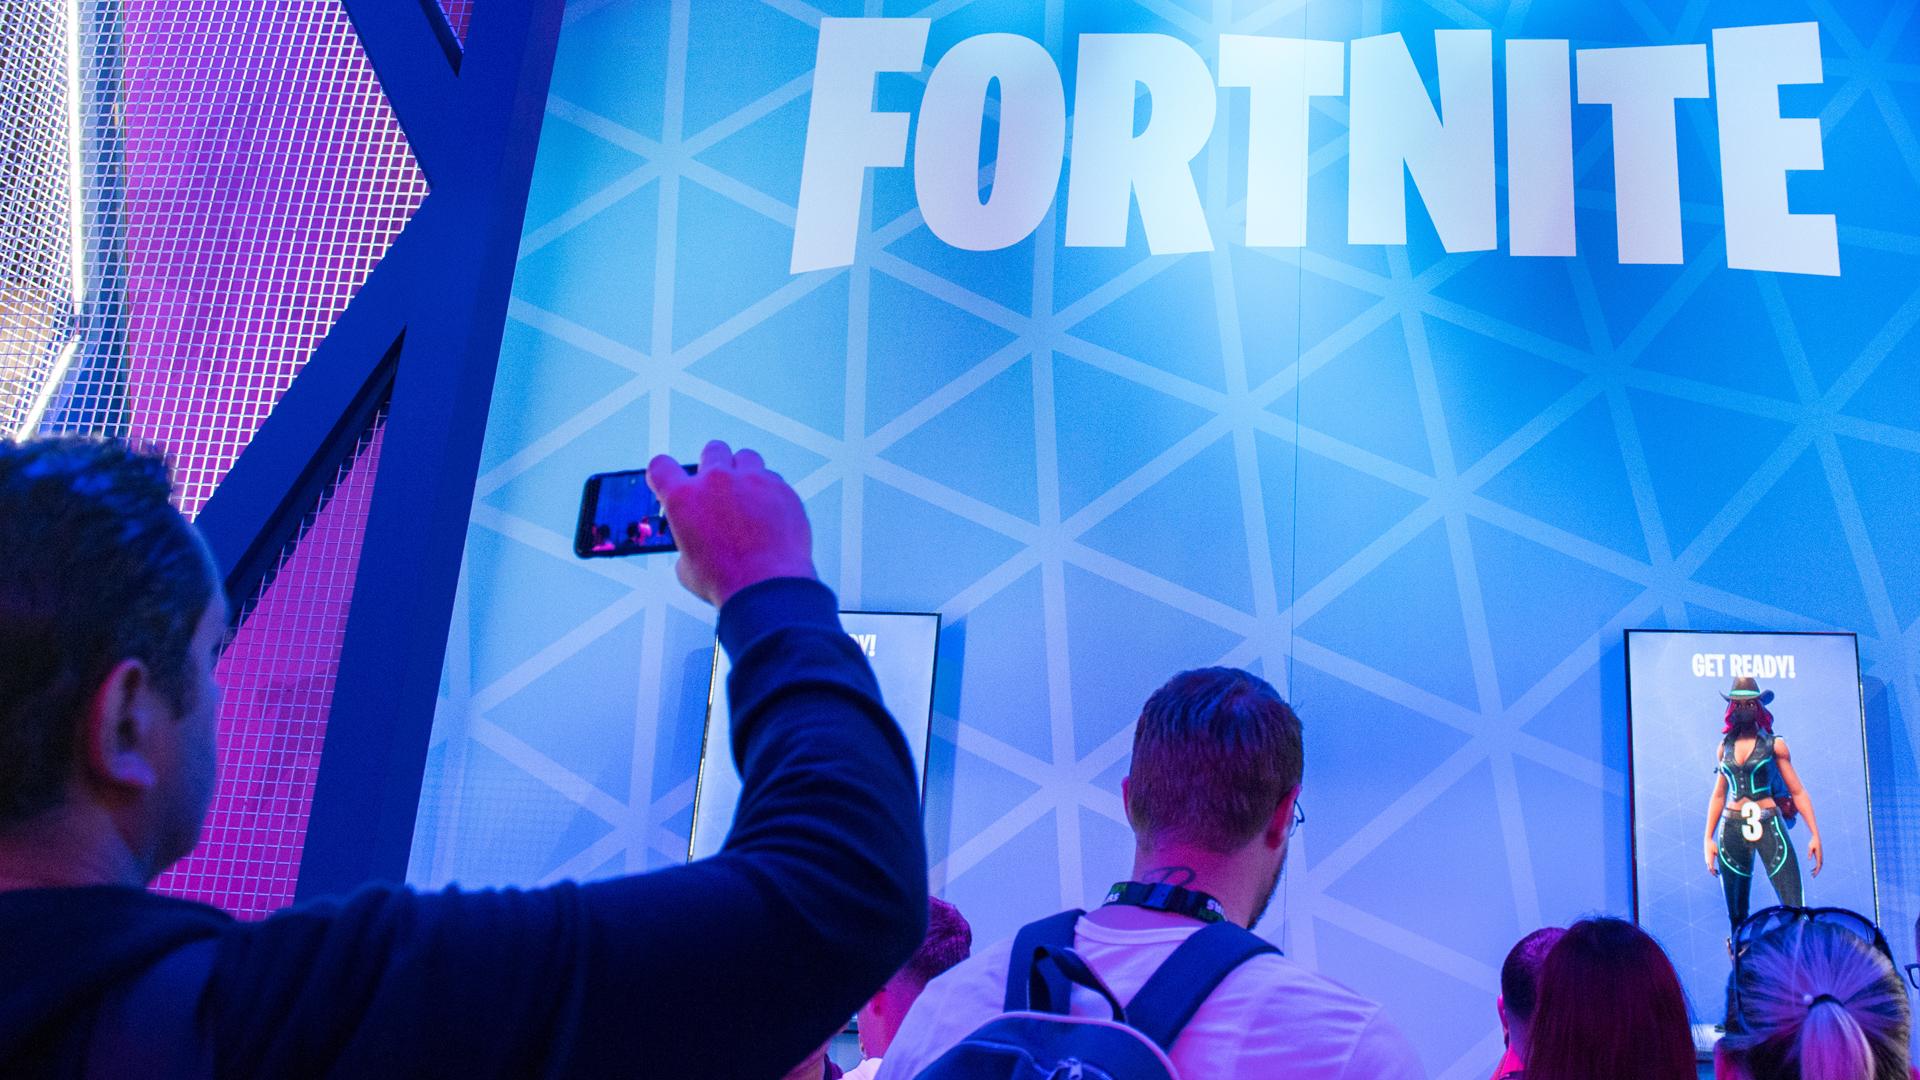 Fortnite-Stand auf der Gamescom. Bild: picture alliance / dpa Themendienst | Andrea Warnecke